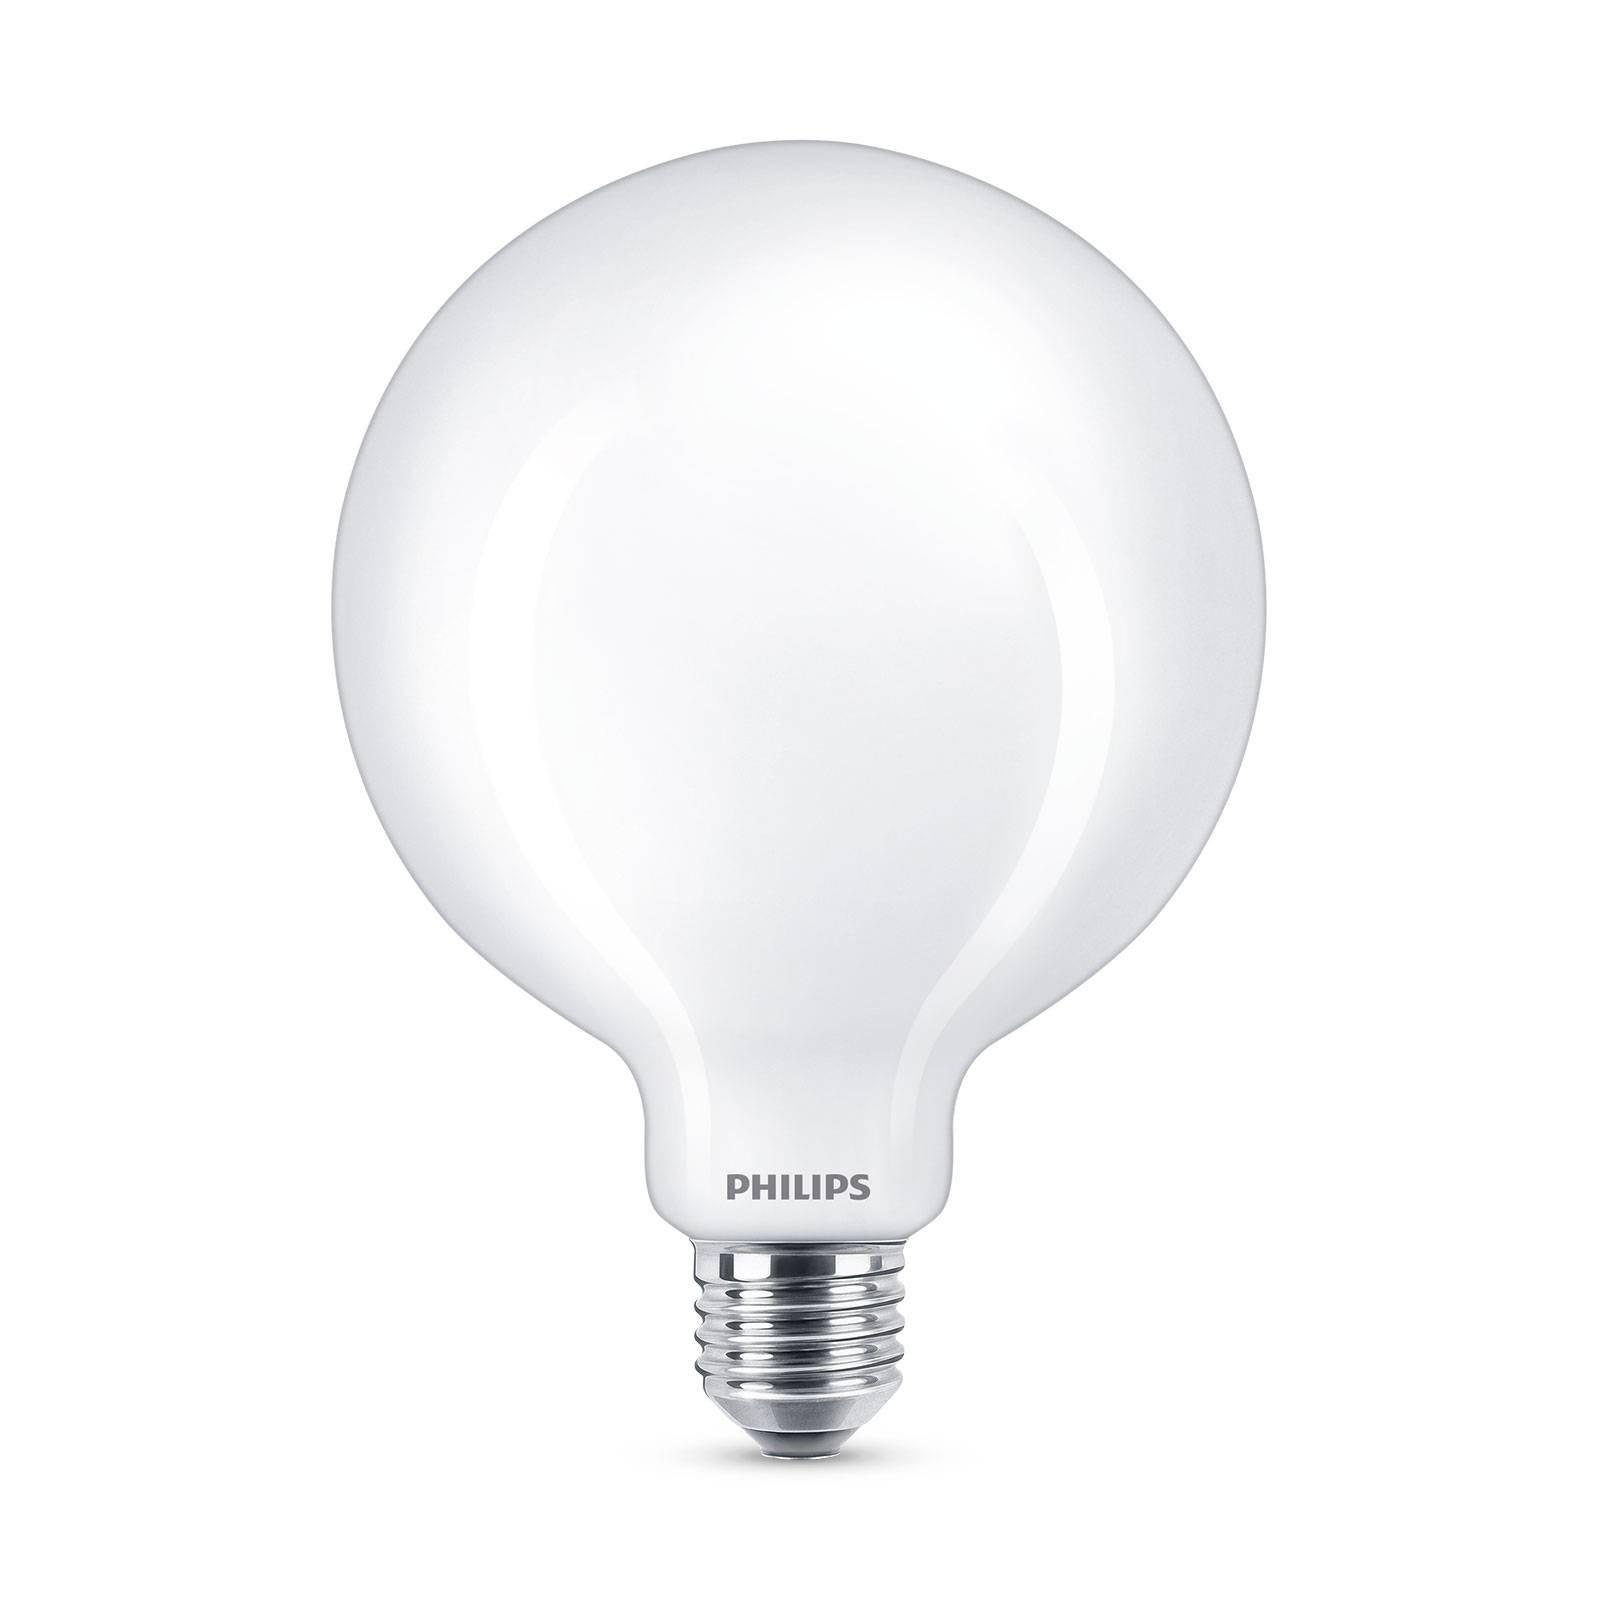 Philips Classic LED-pære E27 G120 7 W 2 700 K opal